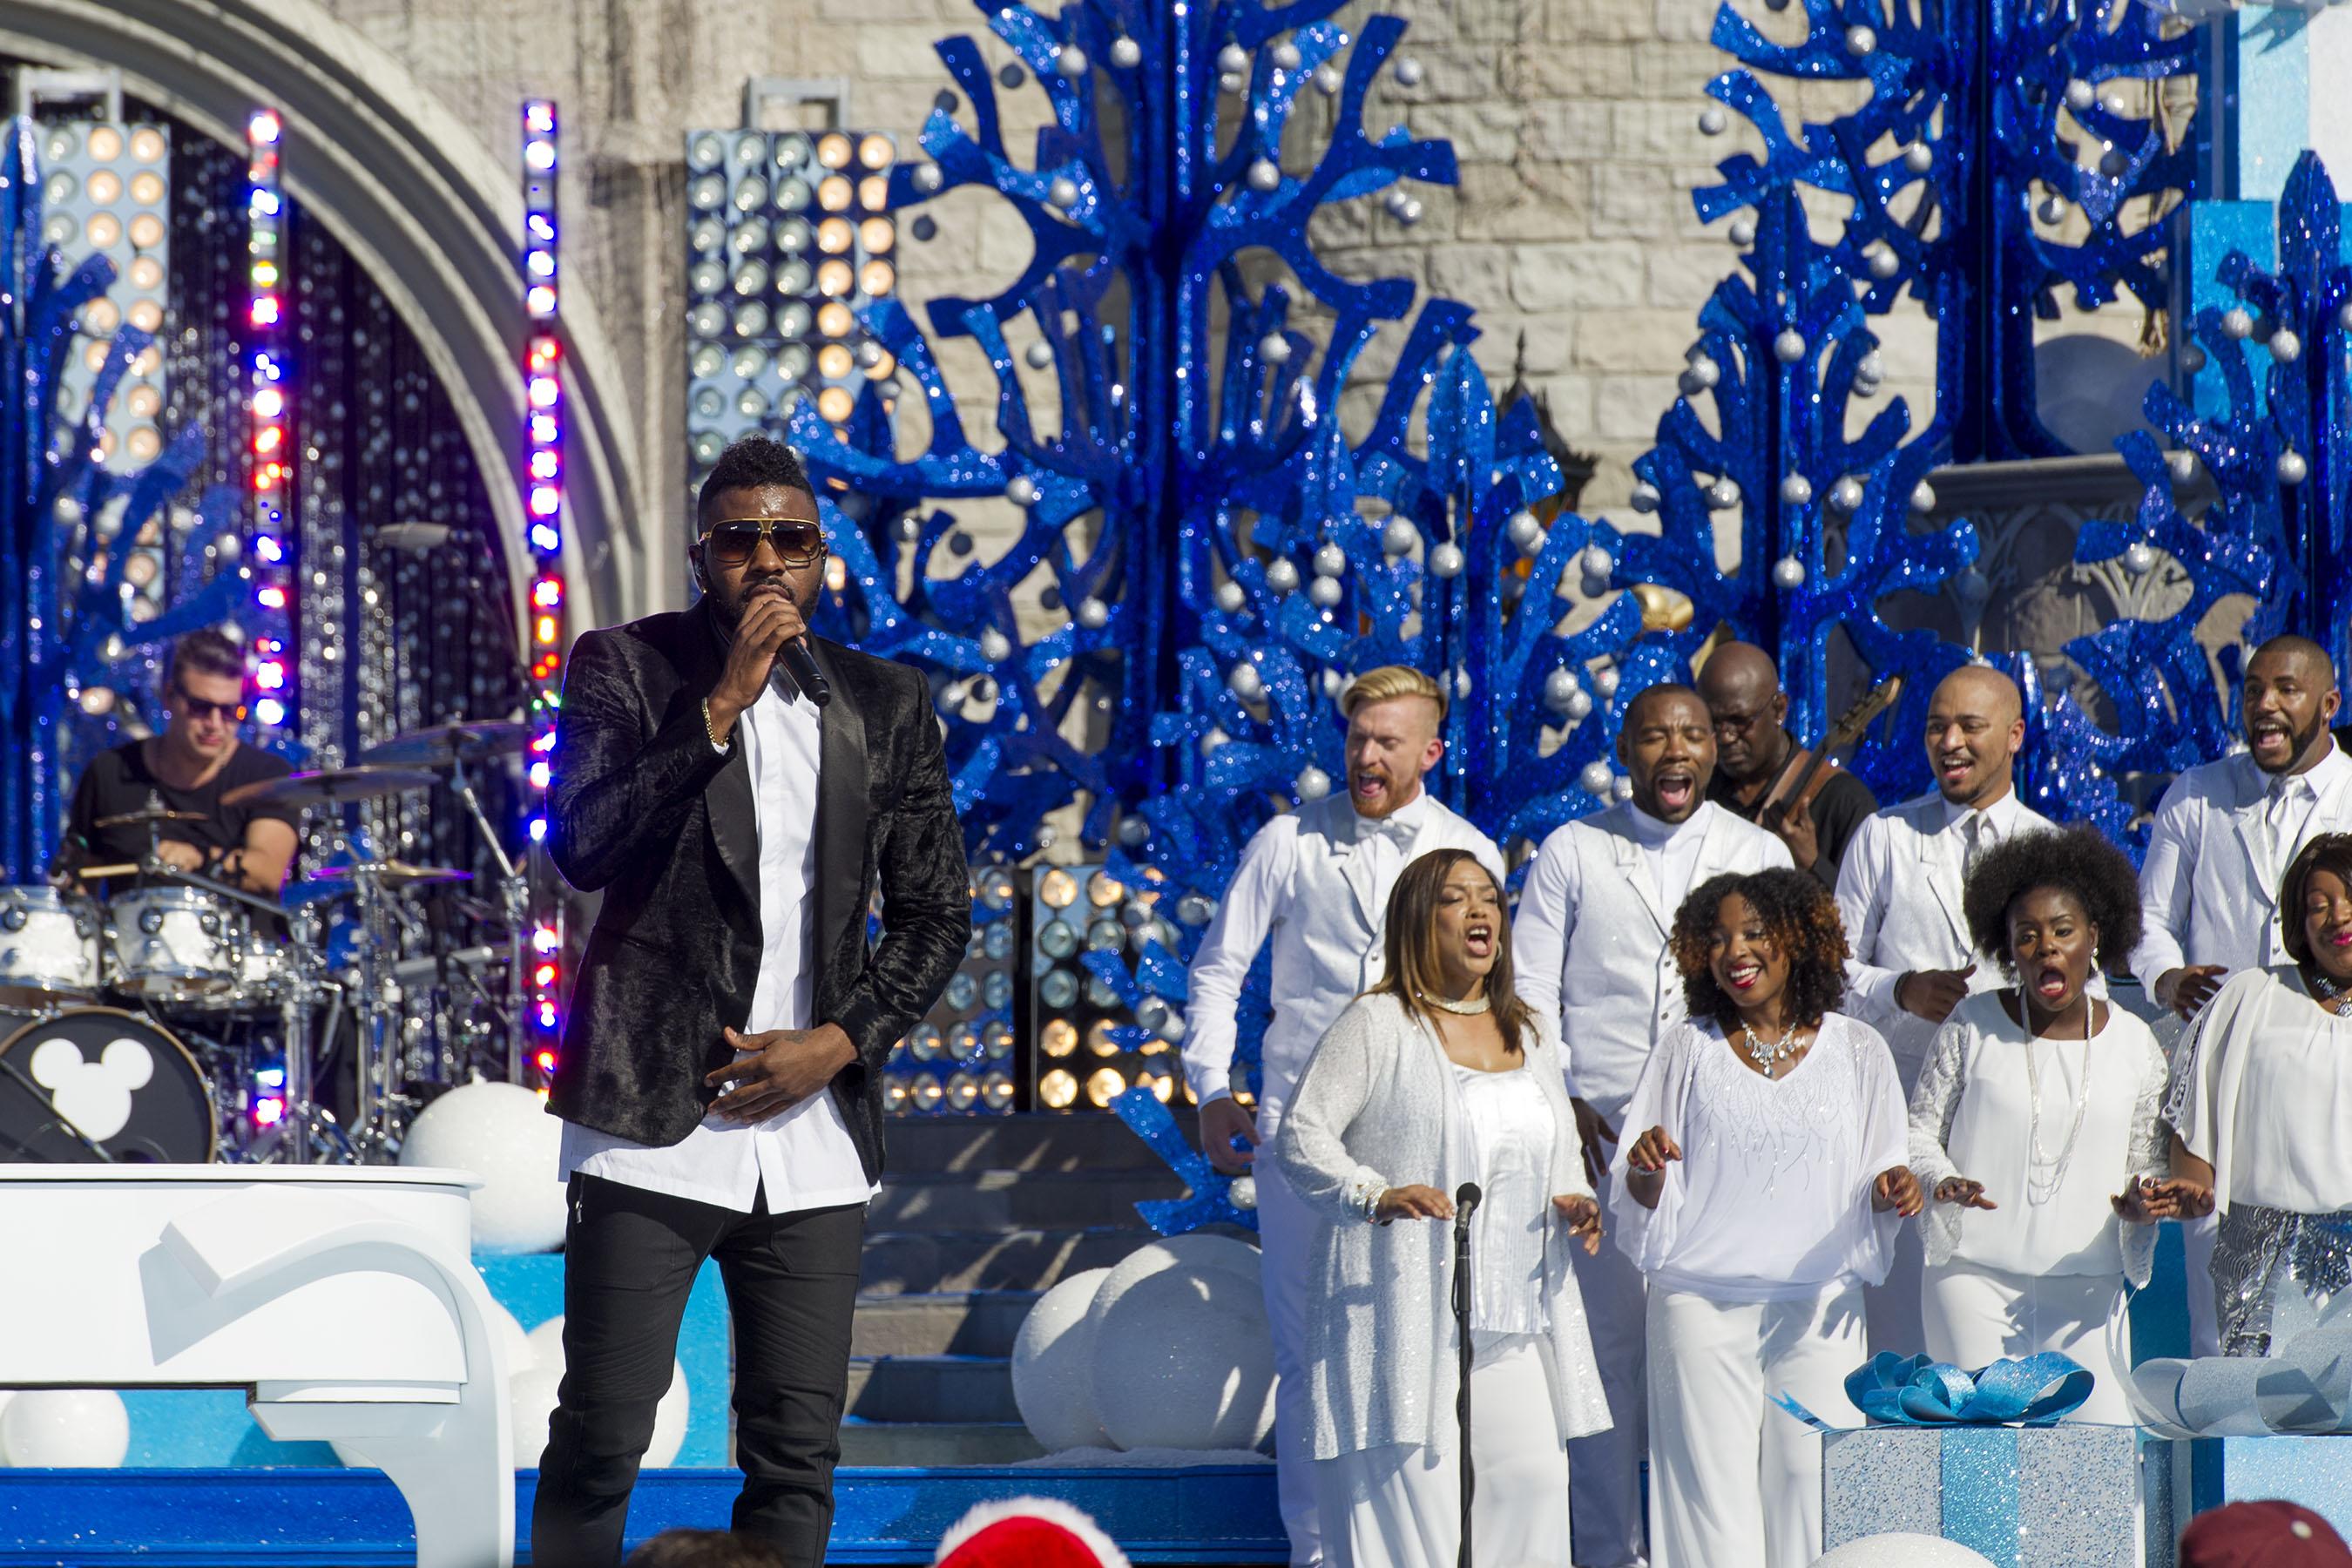 Disney Parks Unforgettable Christmas Celebration performance - Jason Derulo